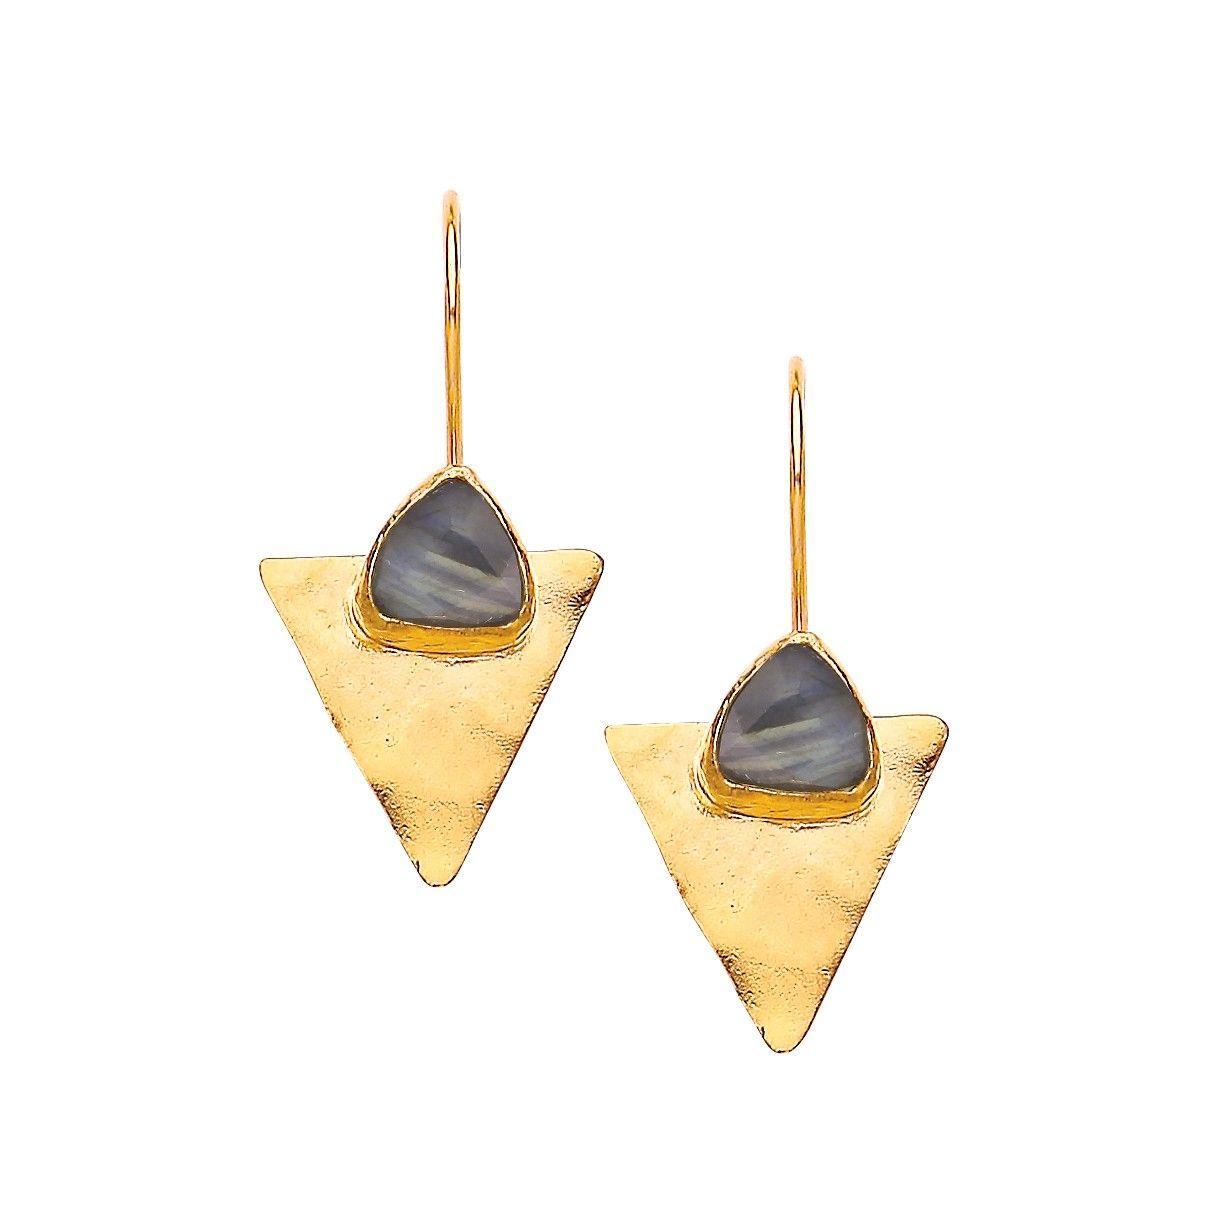 697ea5da3 Ottoman Hands Triangle Labradorite on Hammered Triangle Earrings   Venusi  Jewels